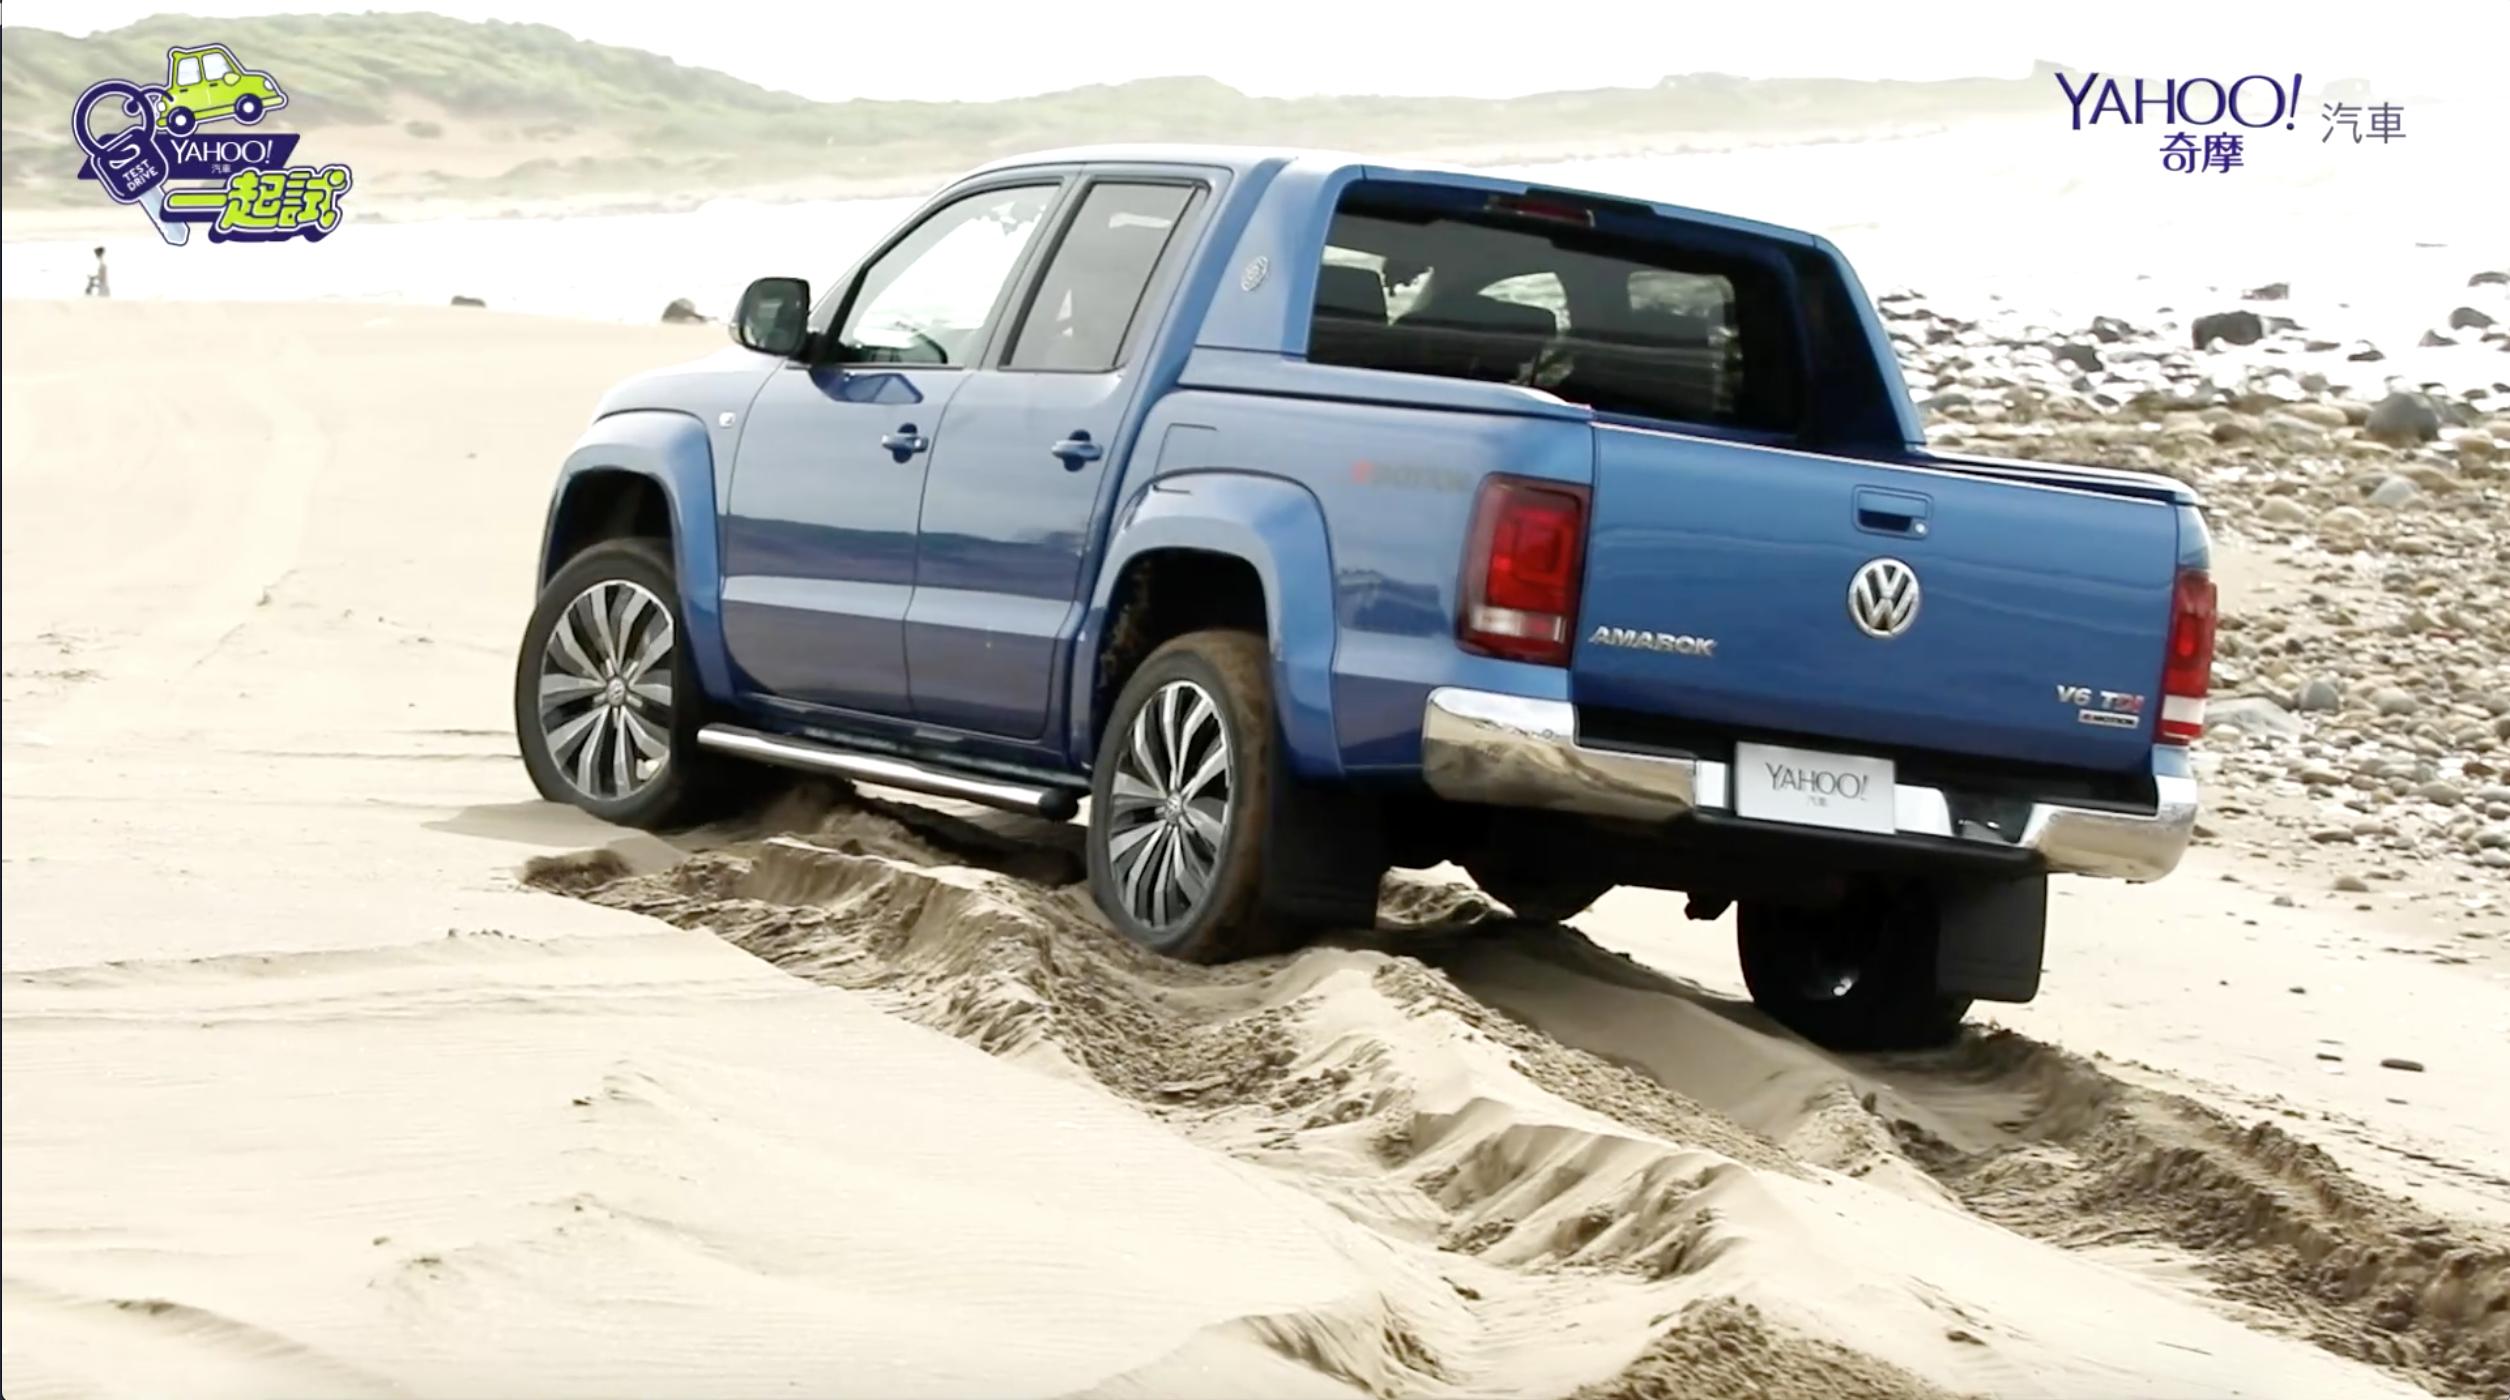 【Yahoo汽車一起試】Vol.7 最強外卡出動:Volkswagen Amarok